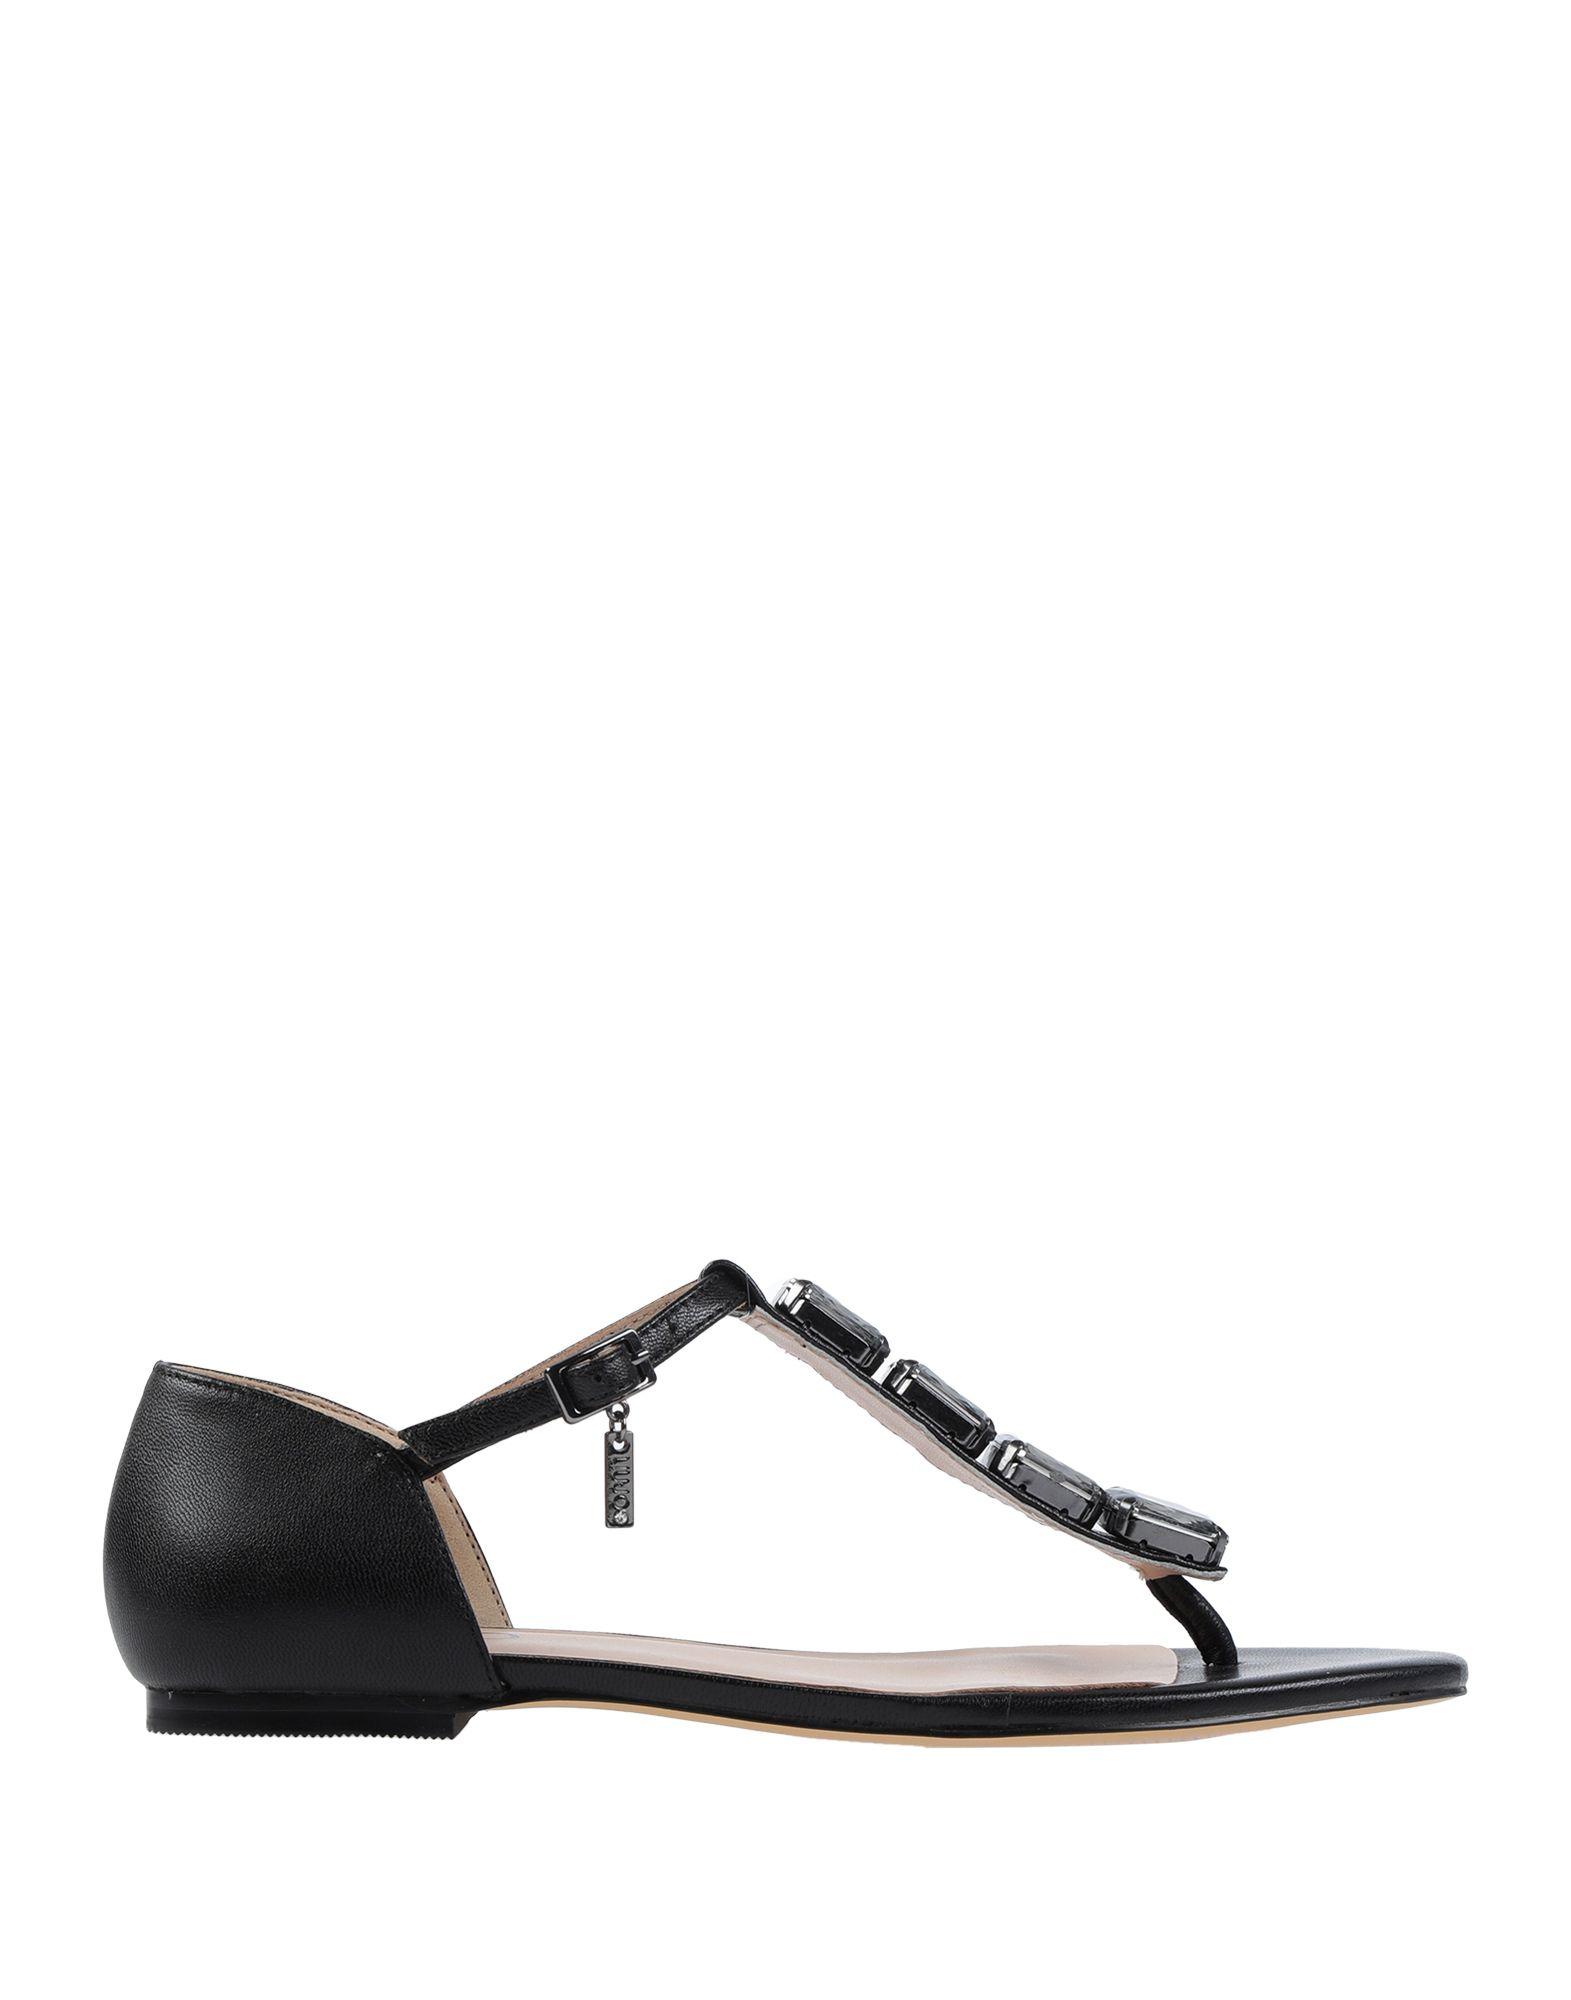 Liu •Jo Shoes Liu Flip Flops - Women Liu Shoes •Jo Shoes Flip Flops online on  Australia - 11552907KQ c962f7